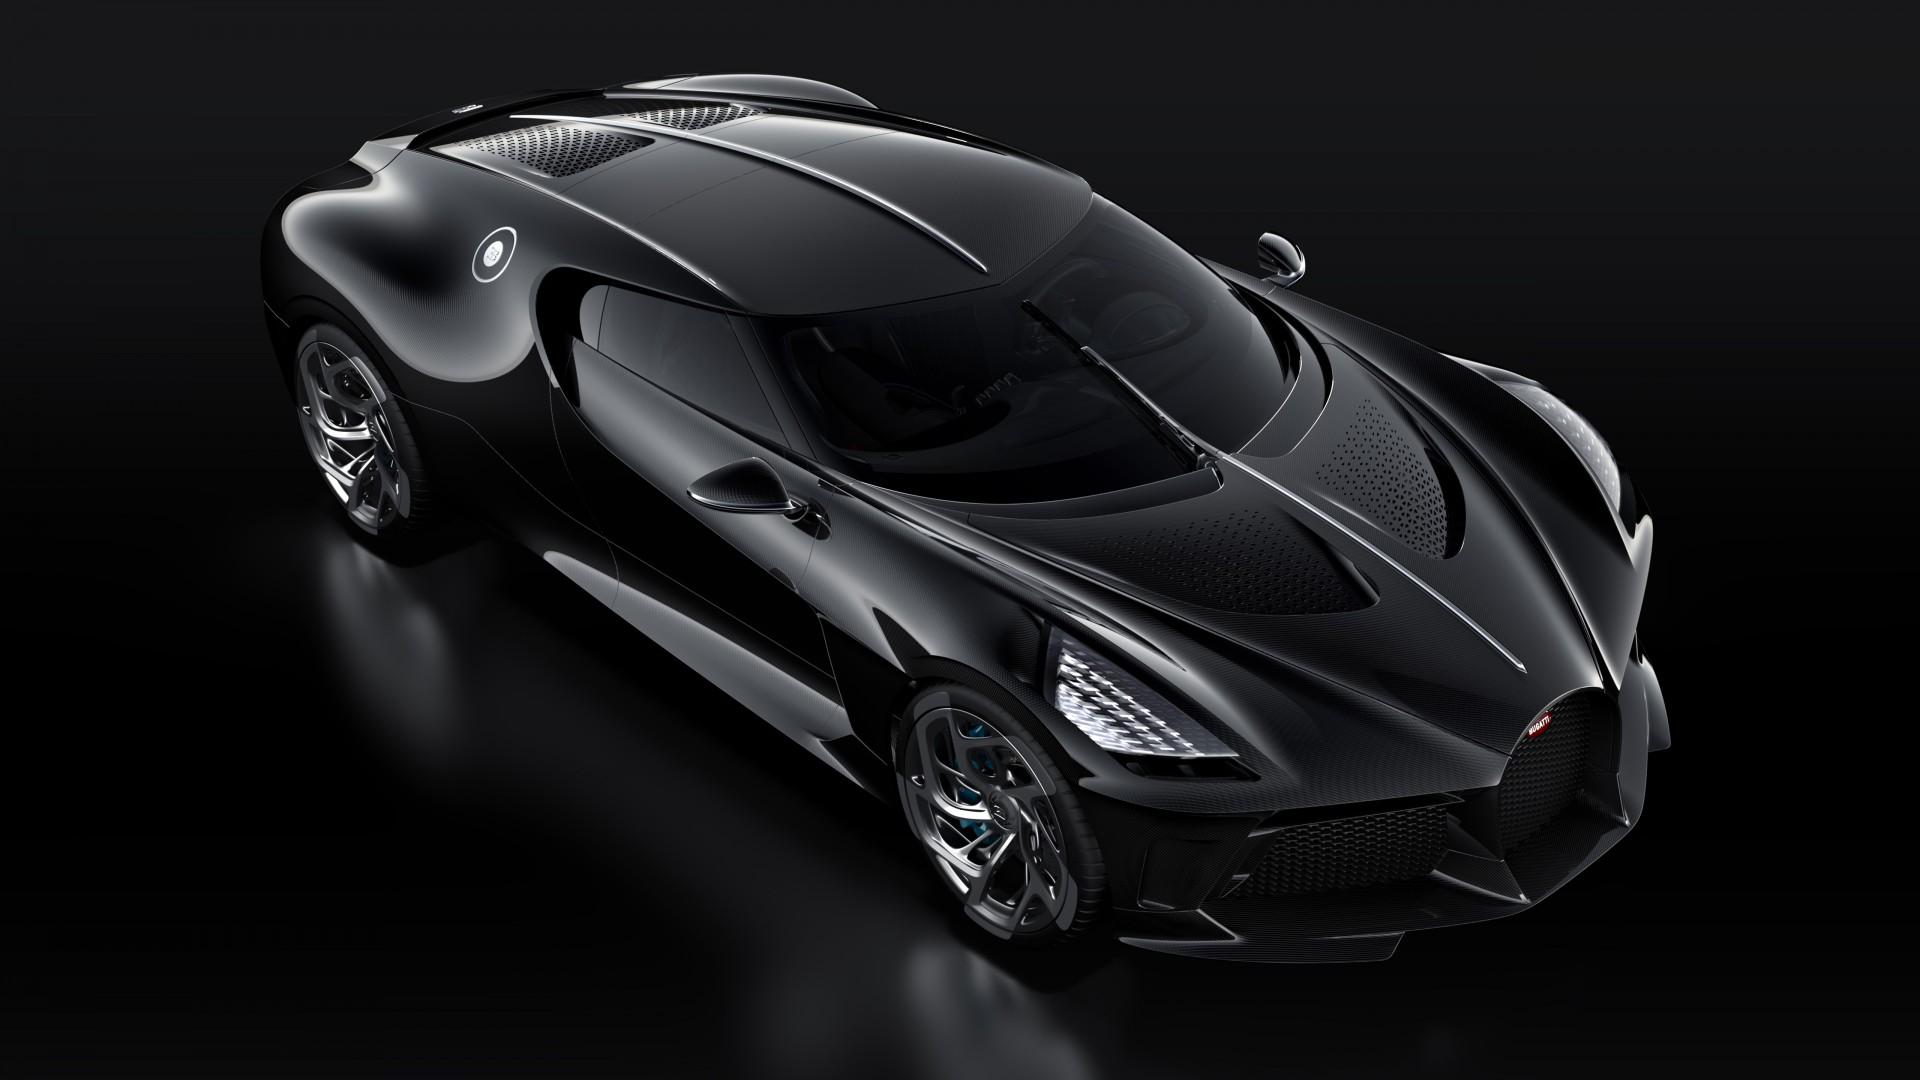 Bugatti La Voiture Noire 2019 4K 5 Wallpaper | HD Car ...